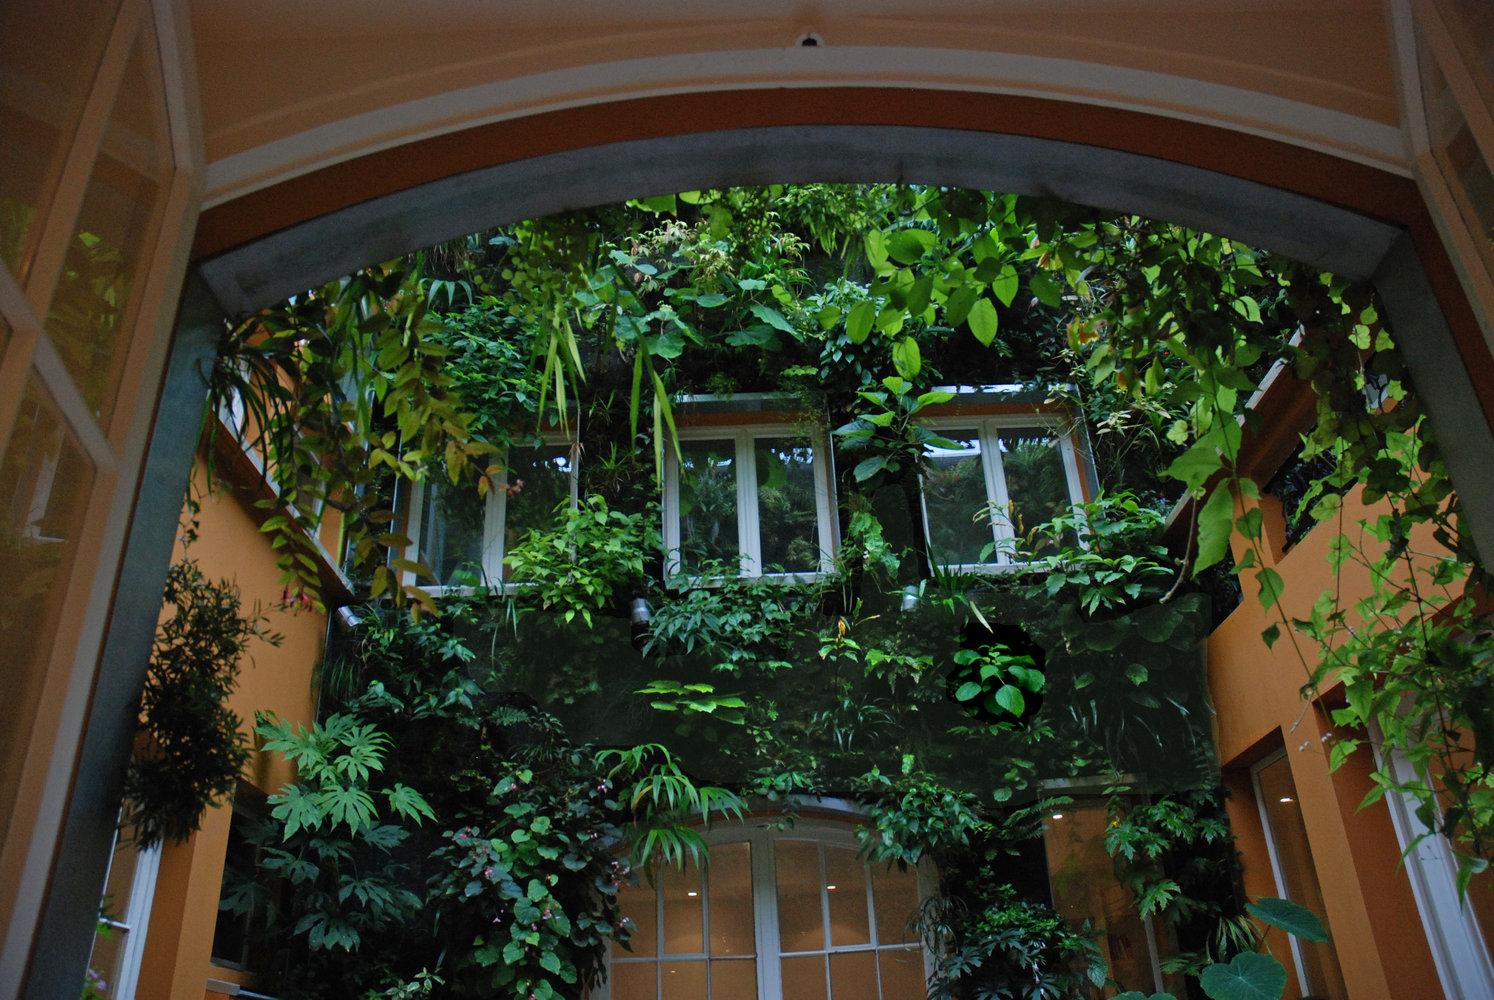 Maison de patrick blanc mur vegetal patrick blanc